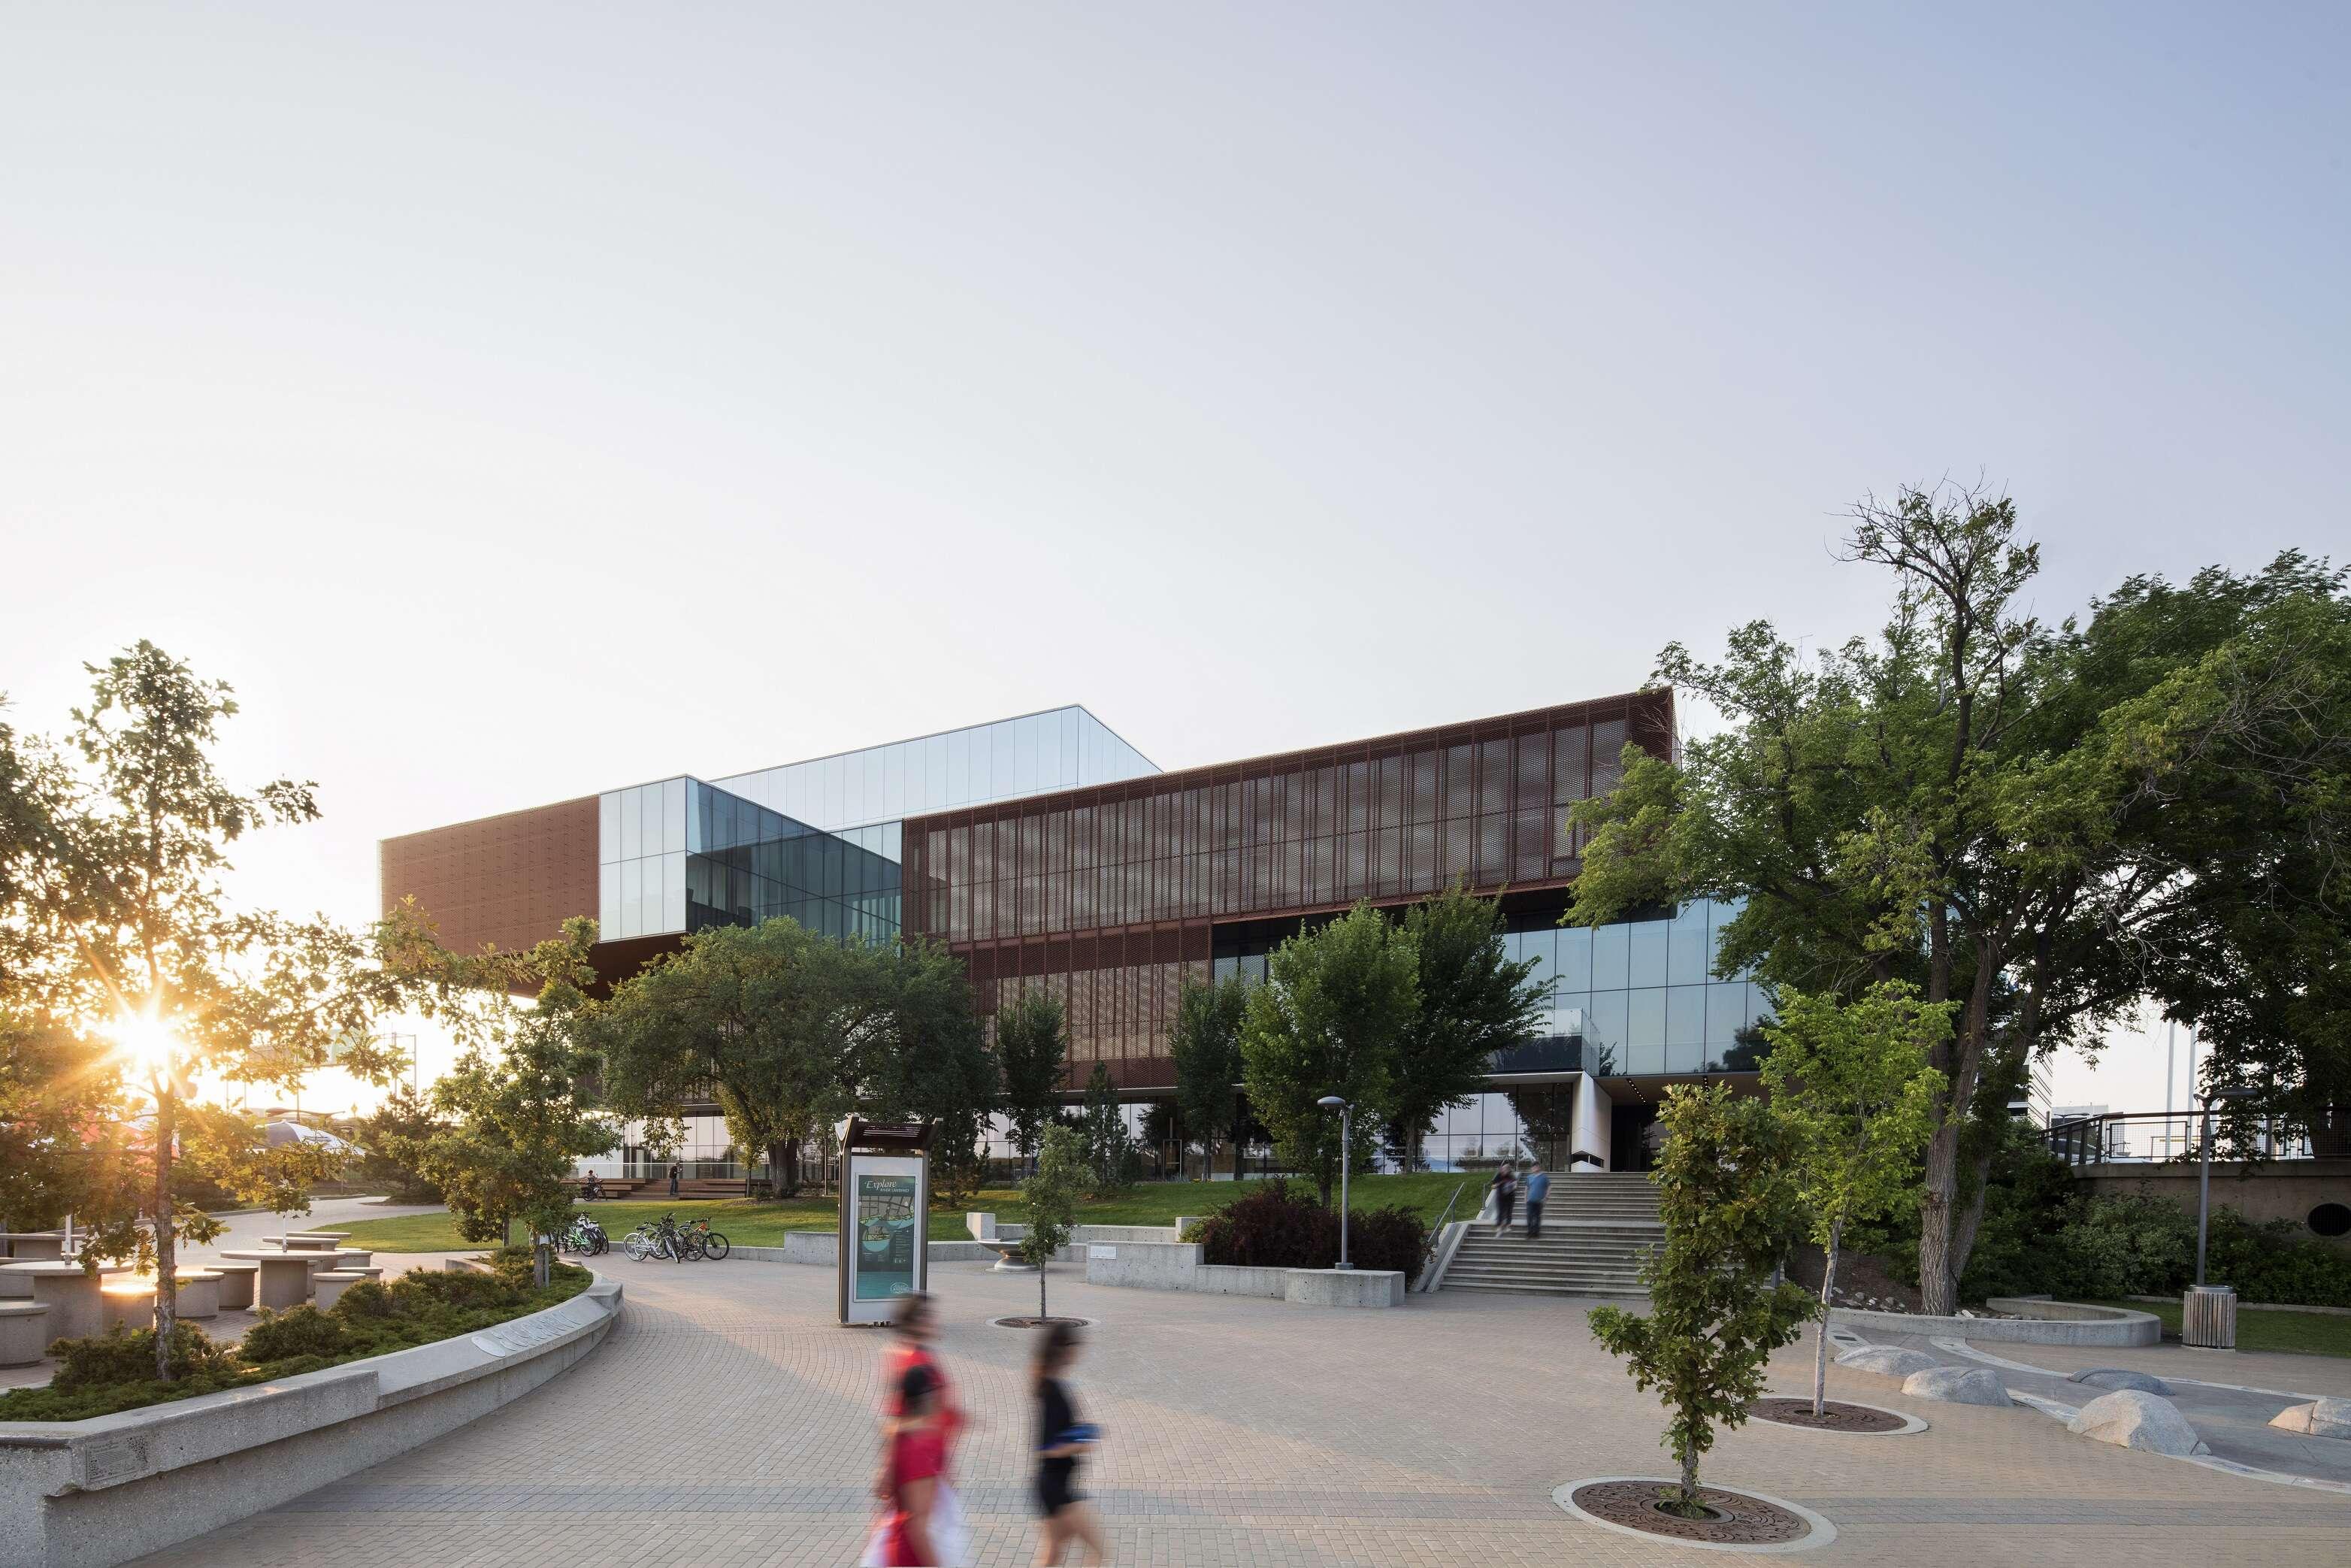 Remai Modern: A New Player on North America's Modern Art Scene